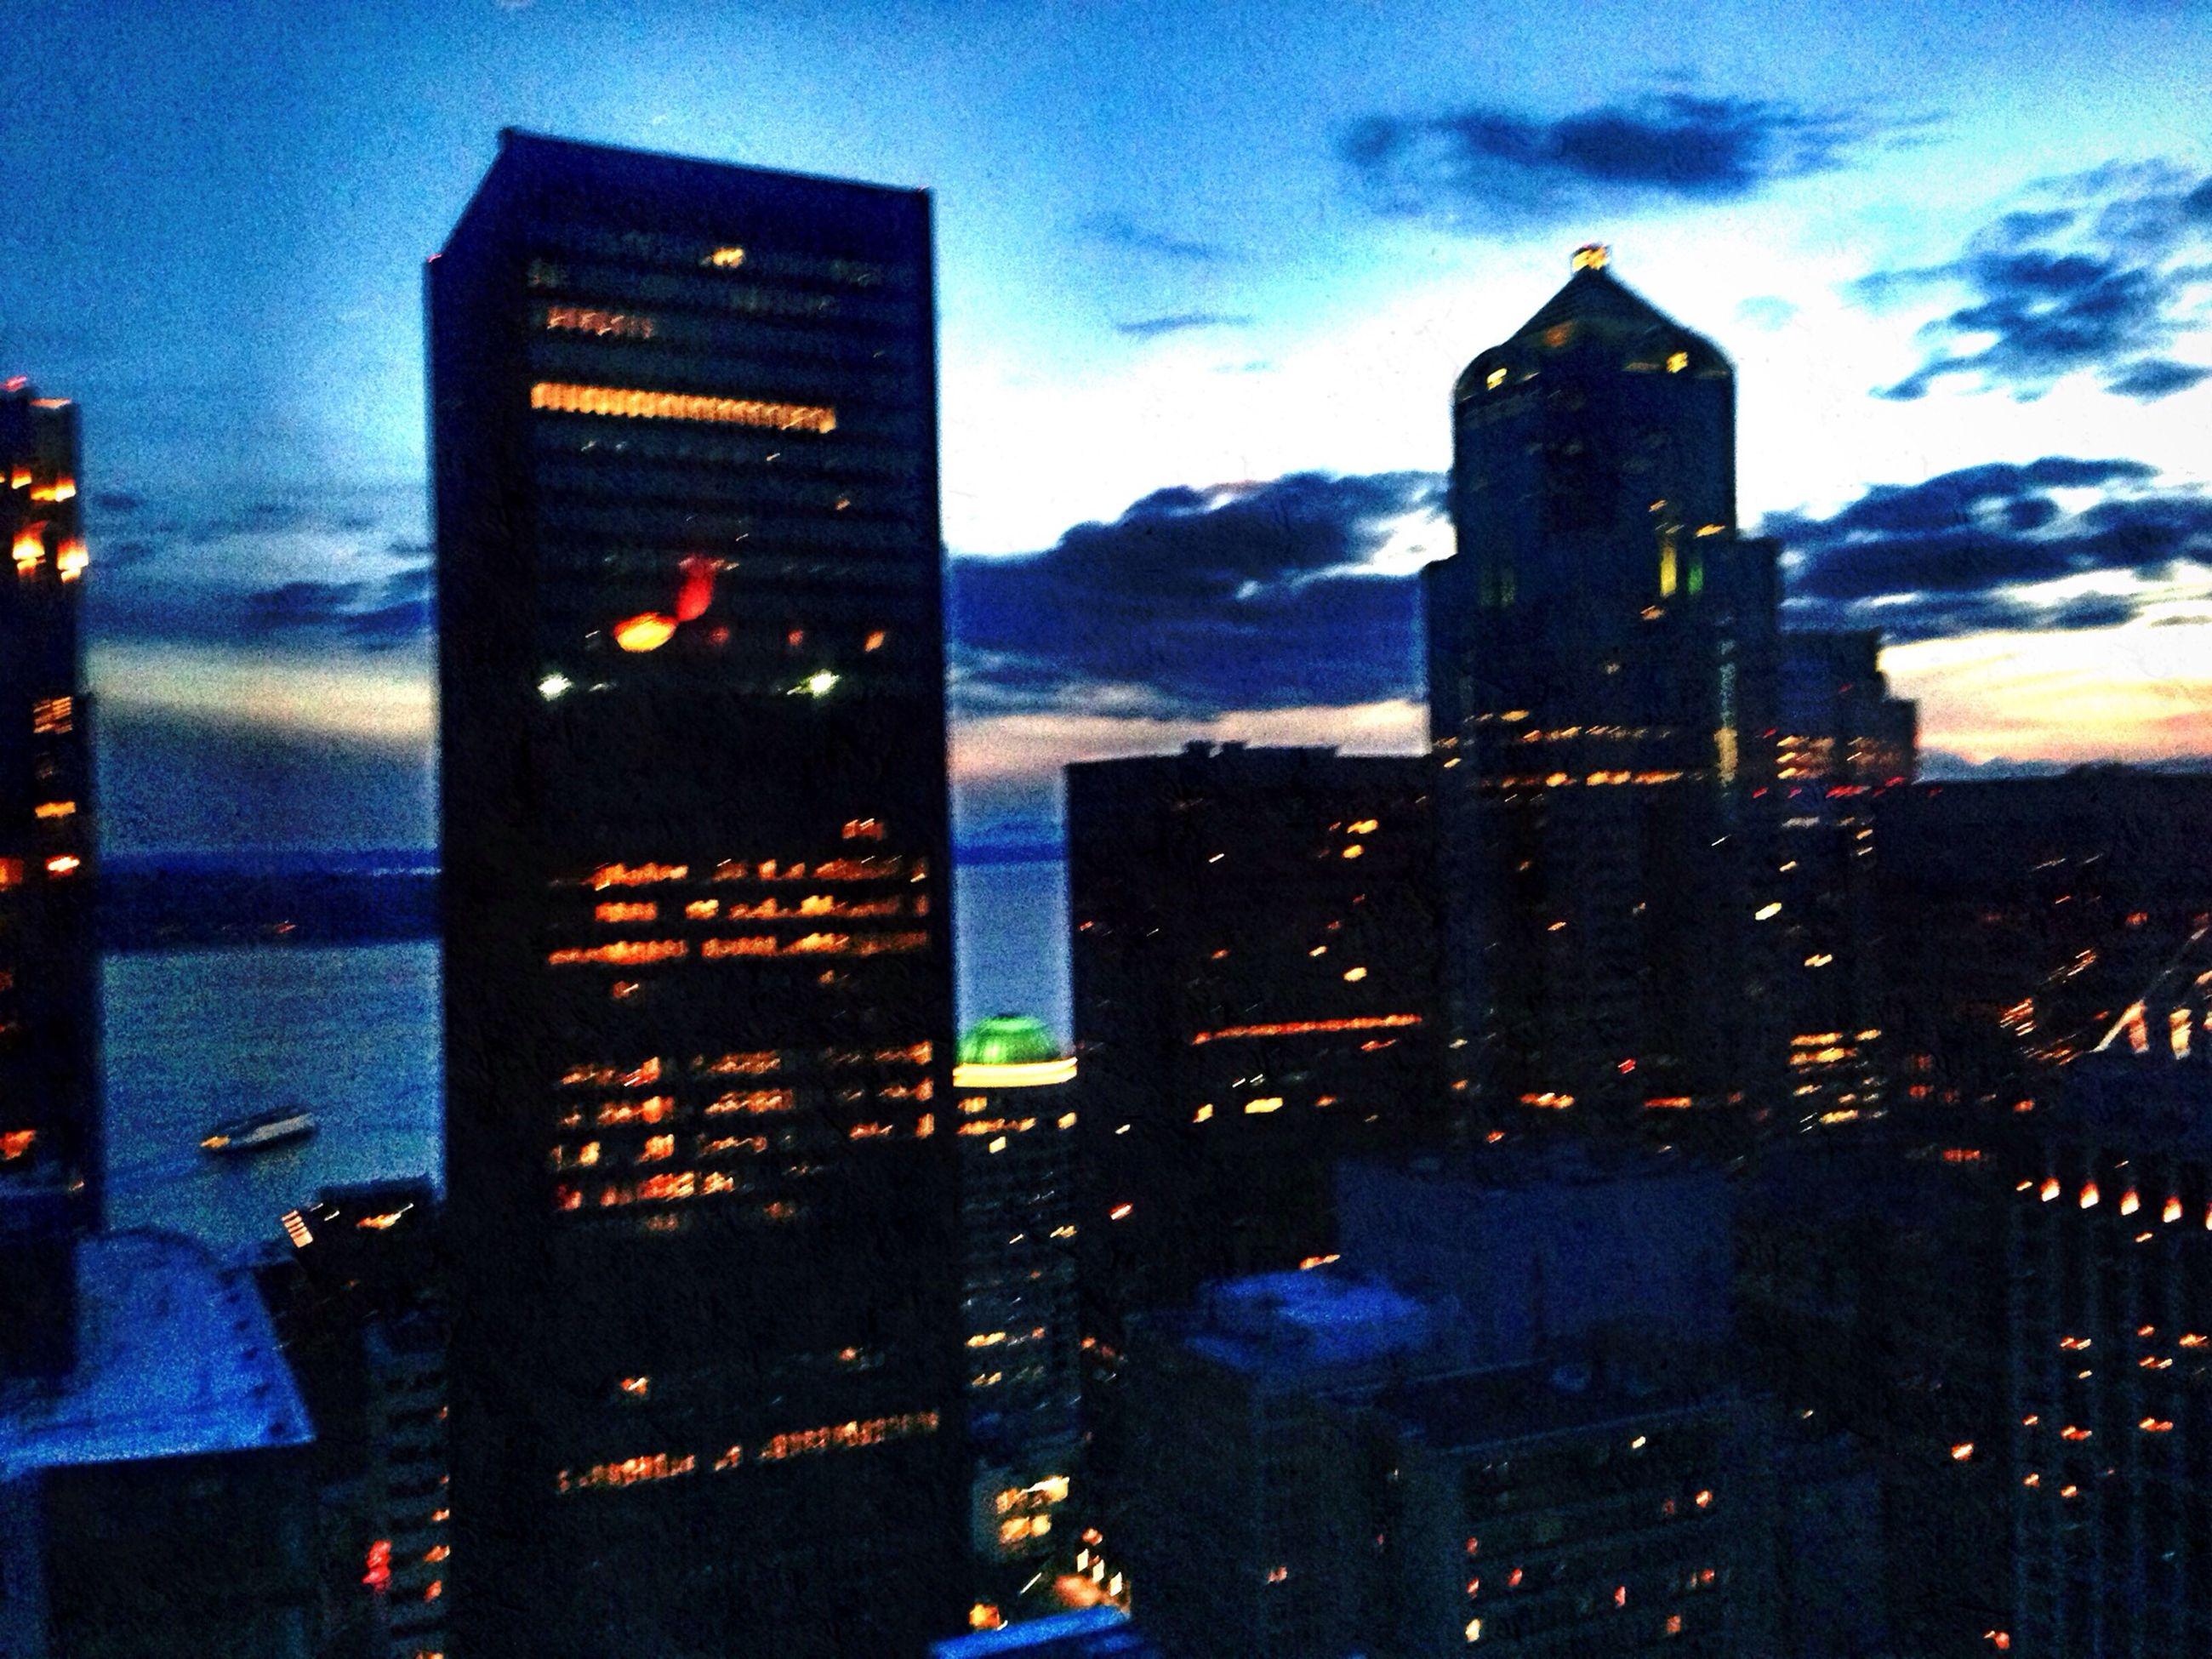 building exterior, architecture, built structure, city, sky, cityscape, building, skyscraper, illuminated, dusk, residential building, tower, city life, cloud - sky, residential structure, weather, office building, season